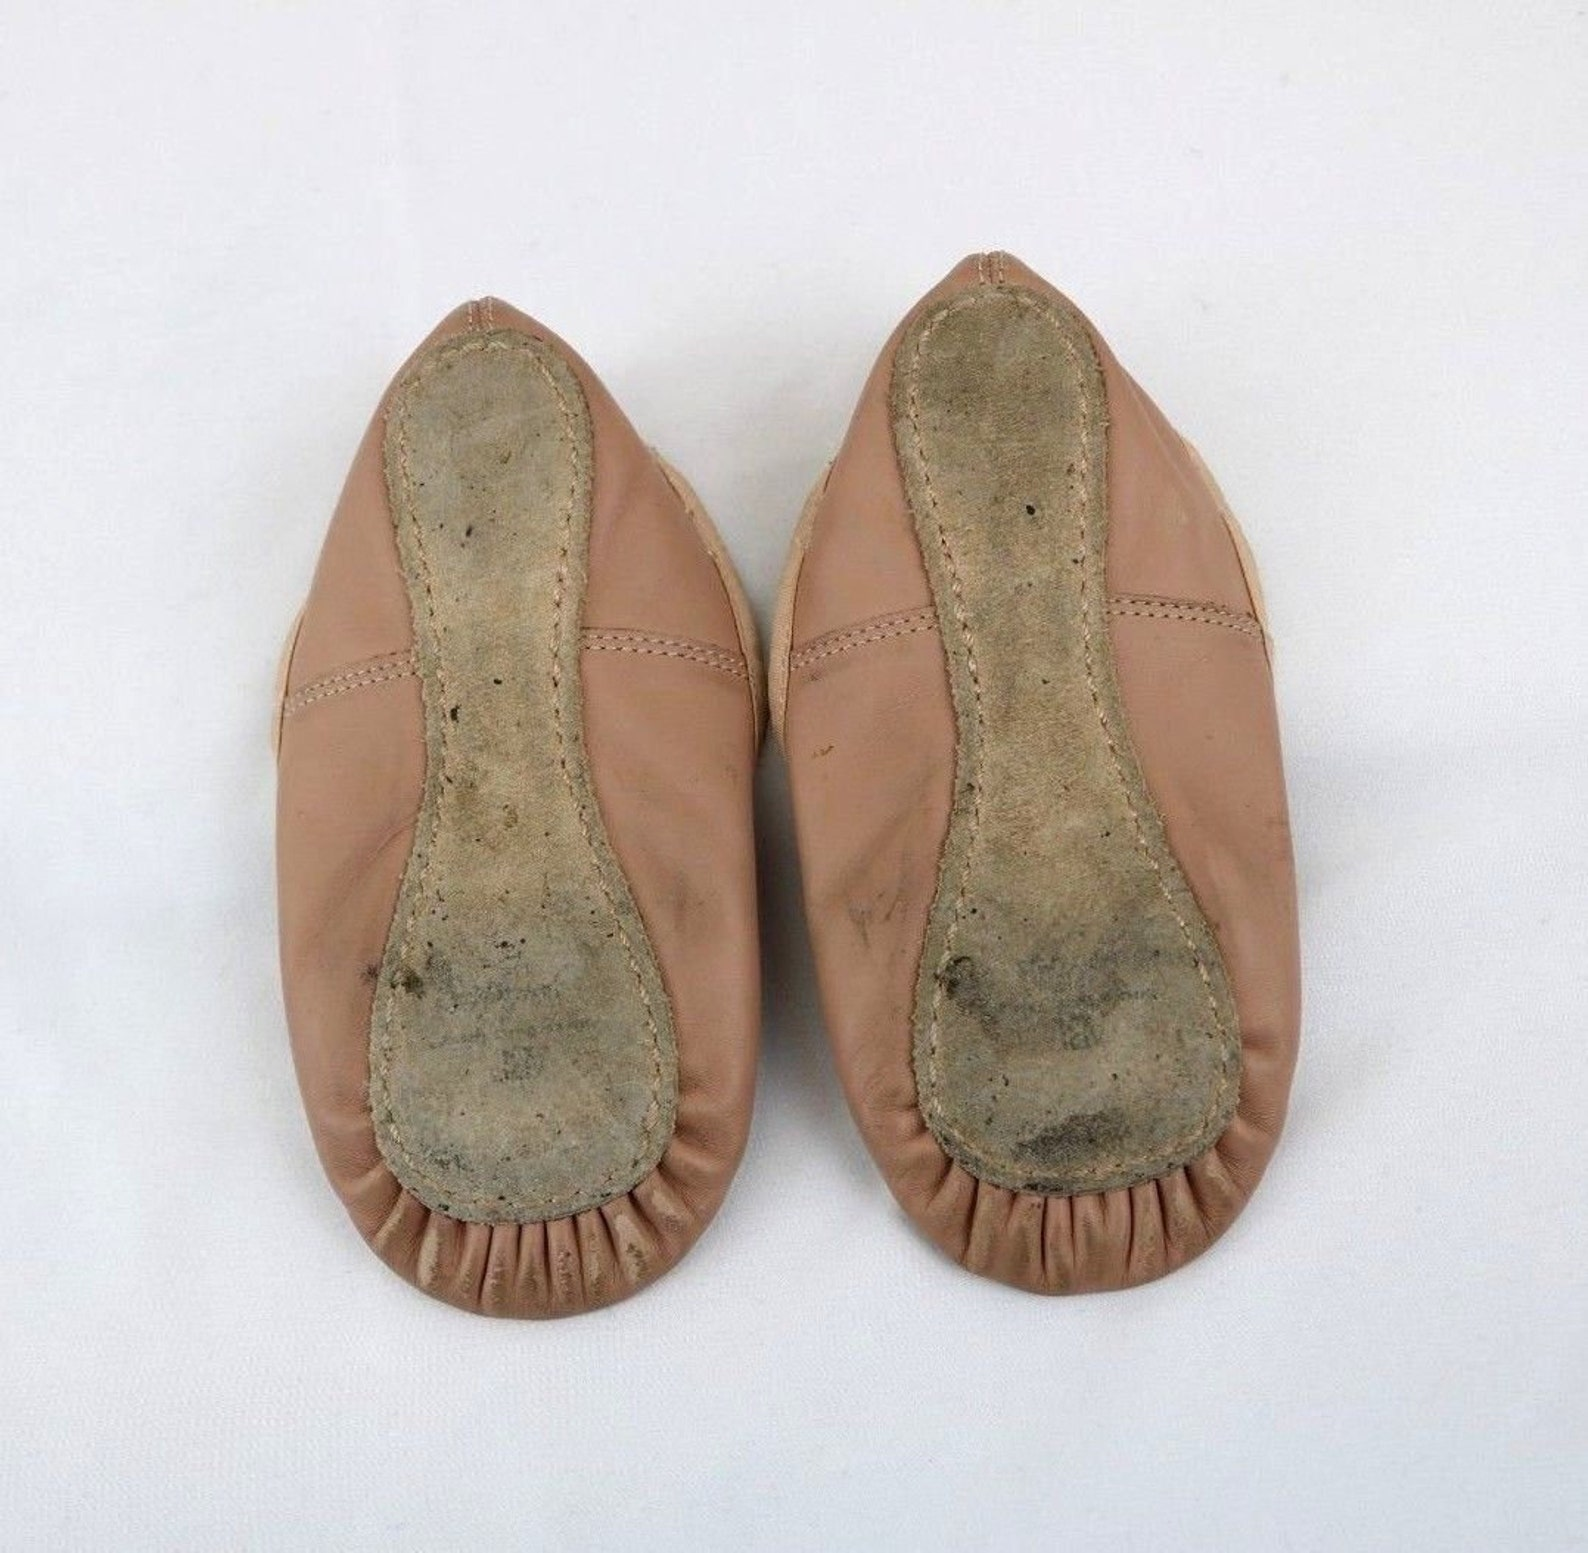 american ballet theater sz 12 1/2 ballet shoes pink